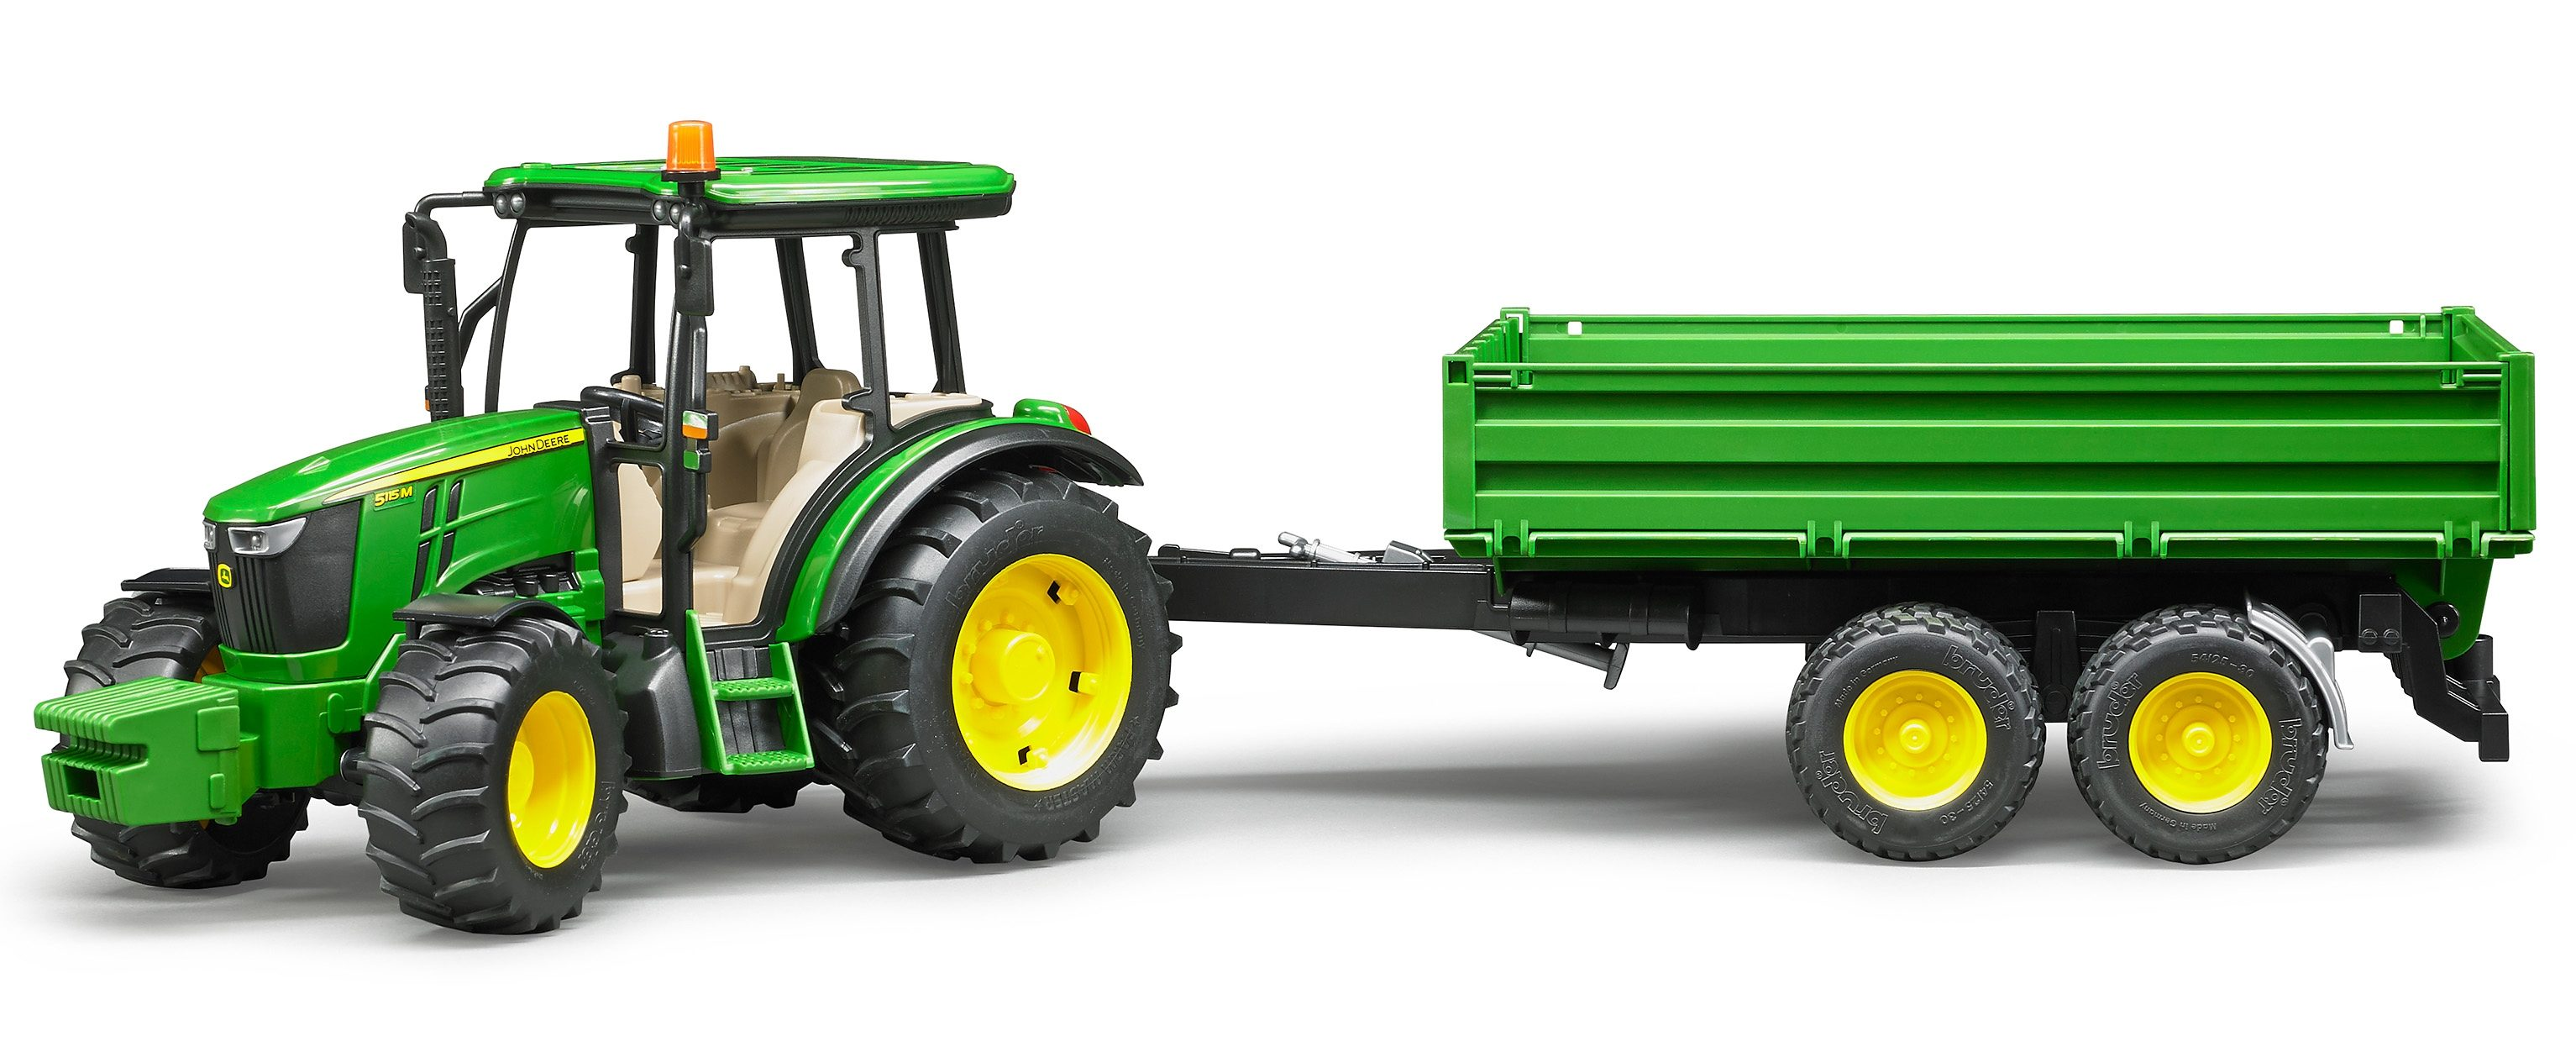 bruder® Traktor mit Anhänger, »John Deere 5115M mit Bordwandanhänger«